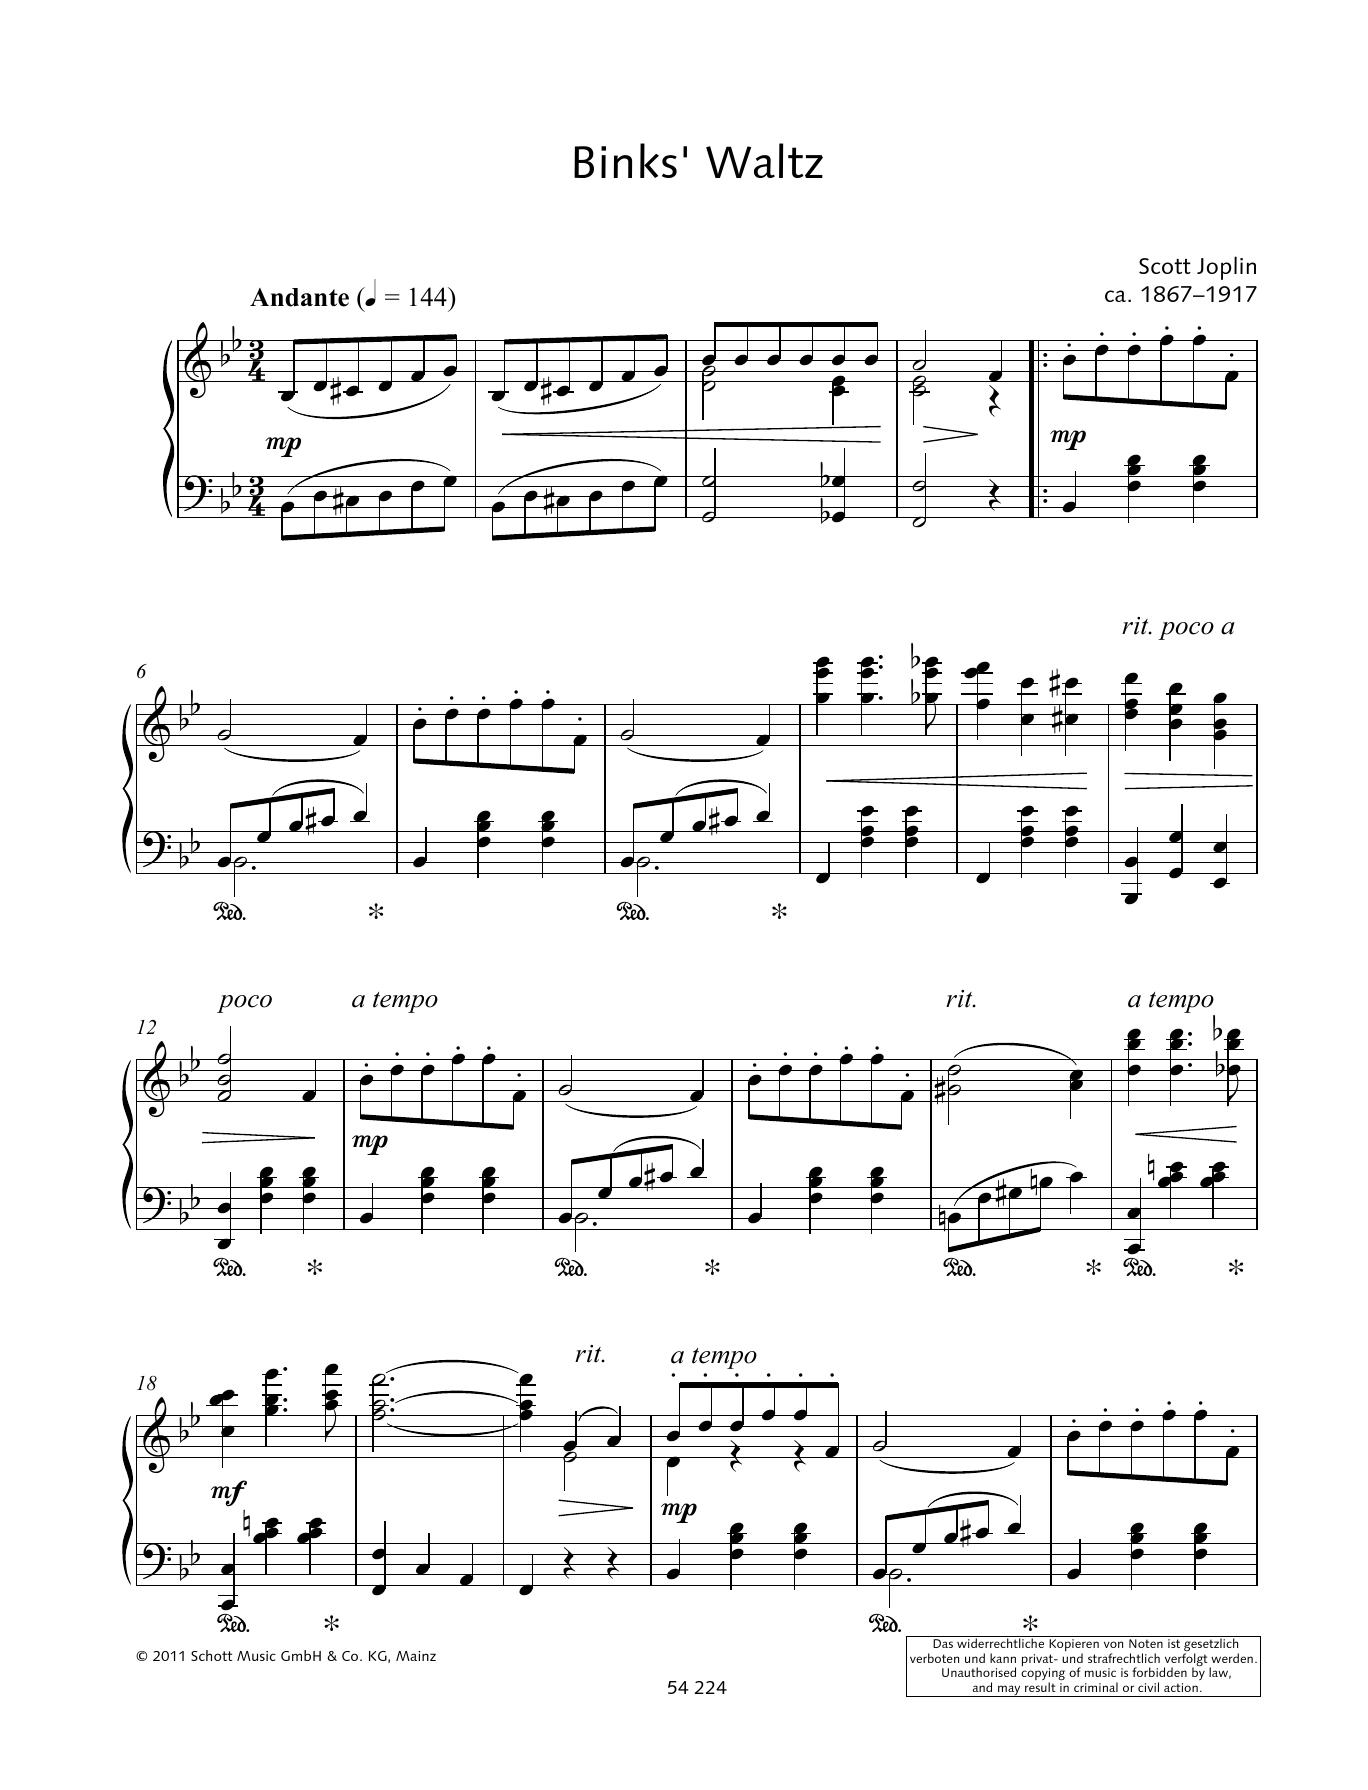 Binks' Waltz Sheet Music